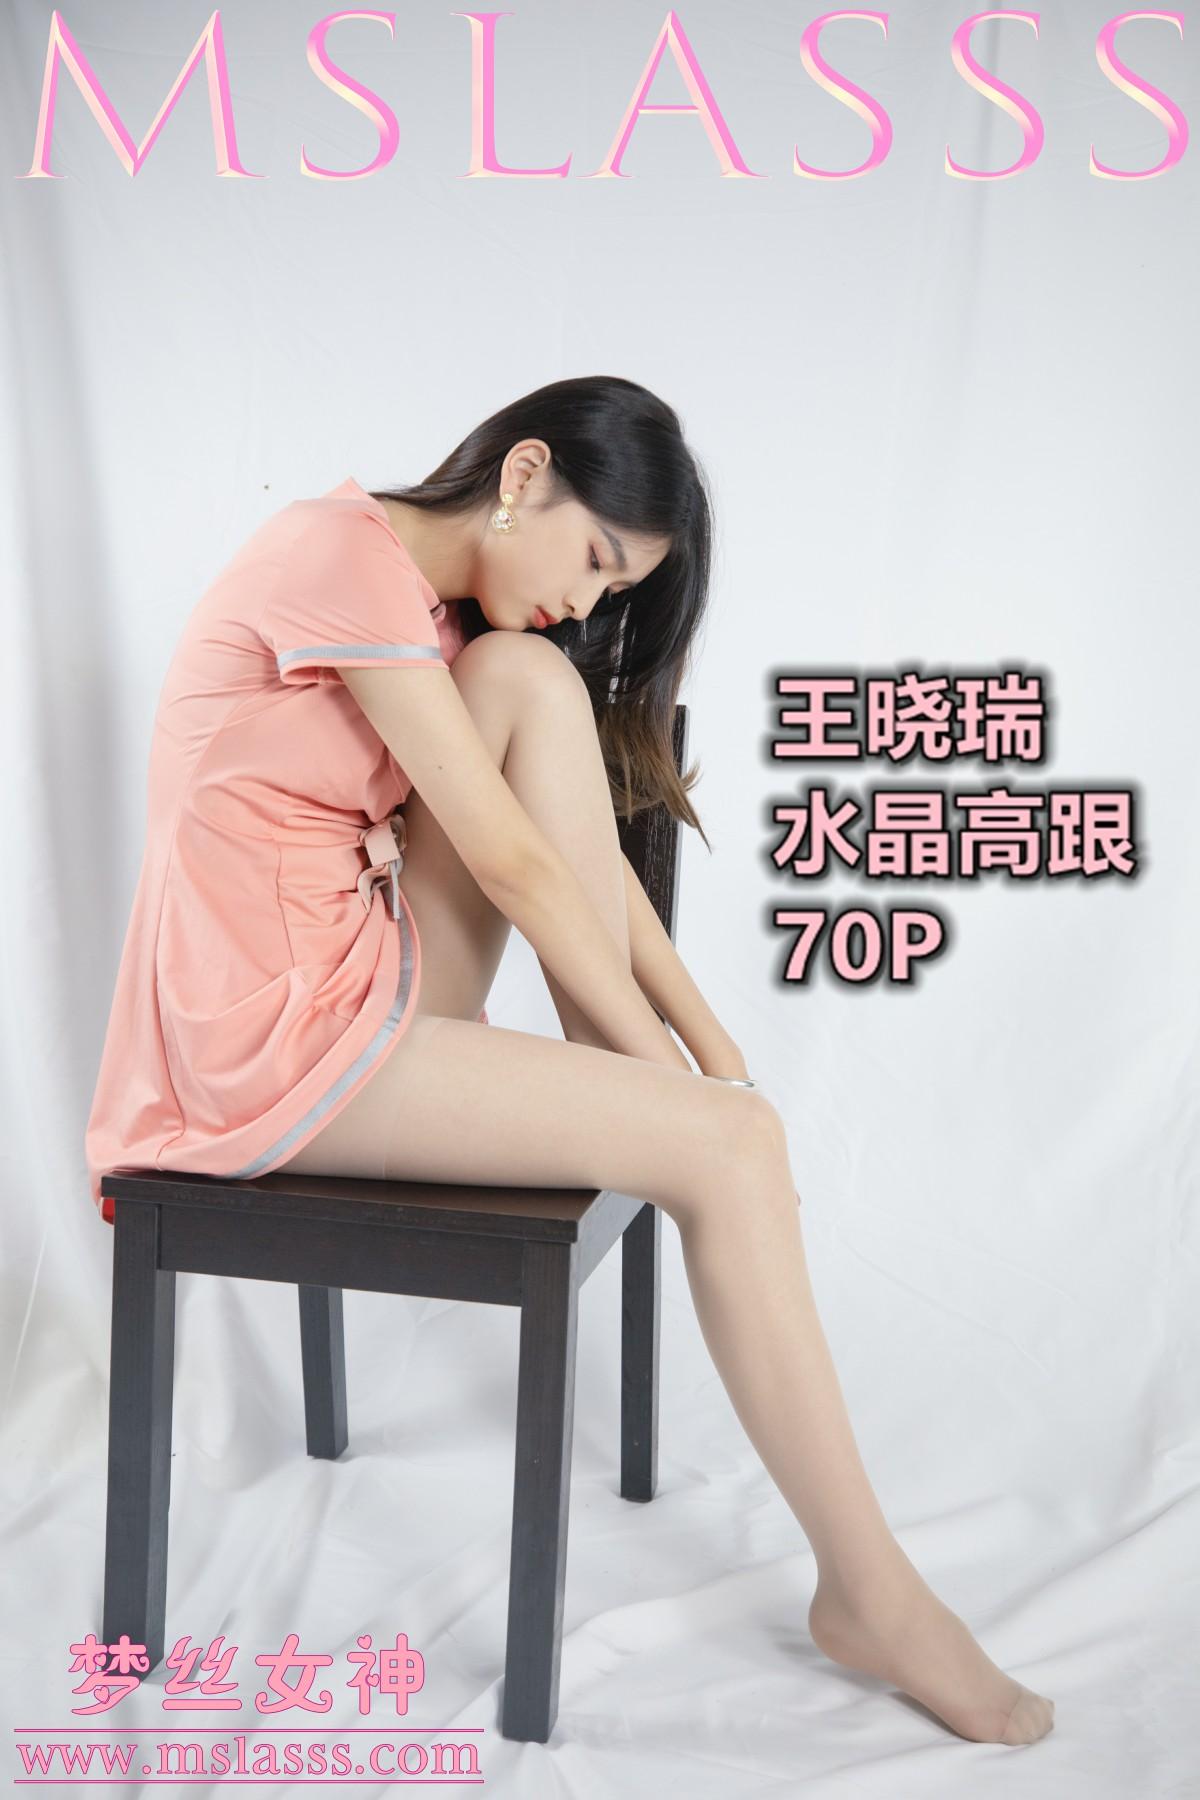 [MSLASS梦丝女神] 2020.11.08 NO.134 王晓瑞《水晶高跟》